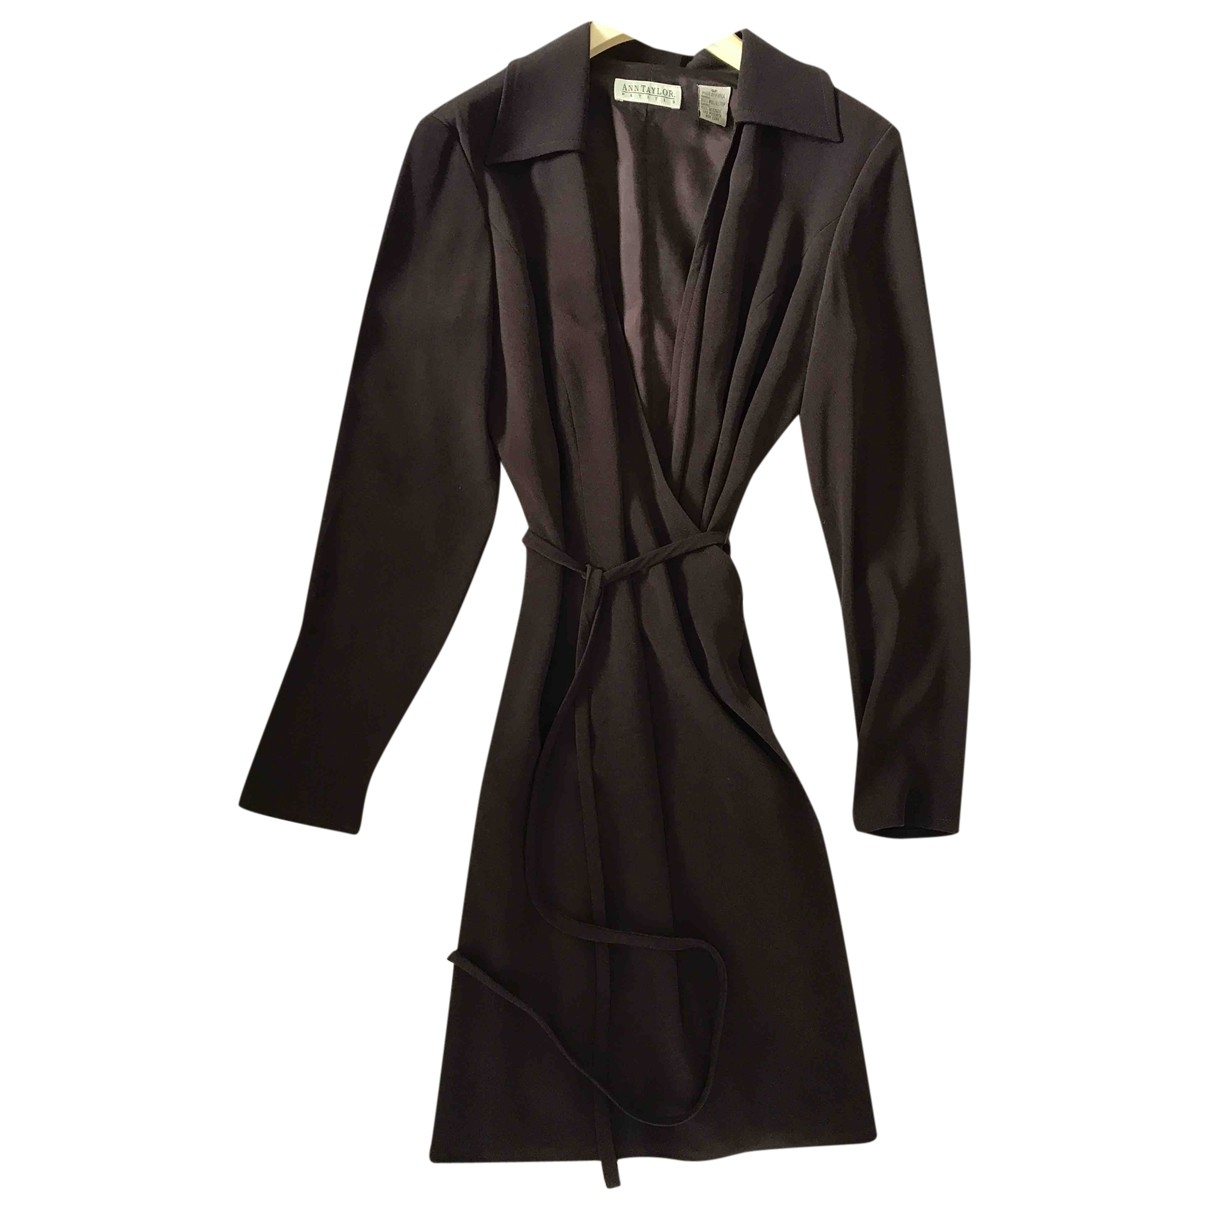 Ann Taylor \N Kleid in  Braun Polyester